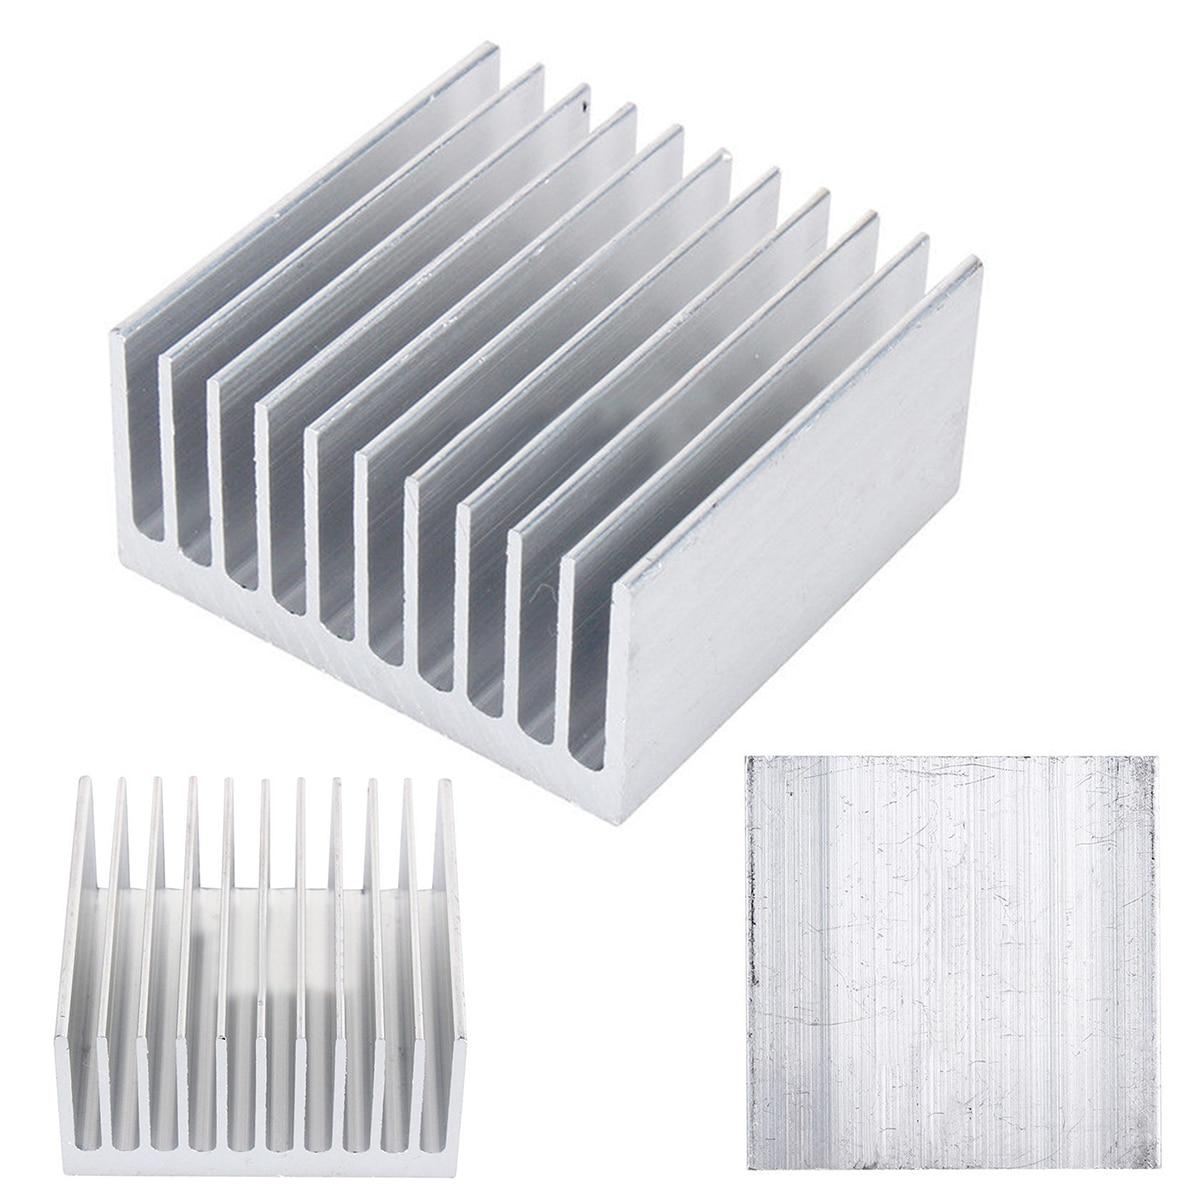 1 Piece White Aluminium Radiator Heatsink 11 Tooth Mayitr Durable Heat Dissipation Heat Sink Cooler 40mm*40mm*20mm 2 x b ddr ddr2 ram memory cooler heat spreader heatsink z09 drop ship